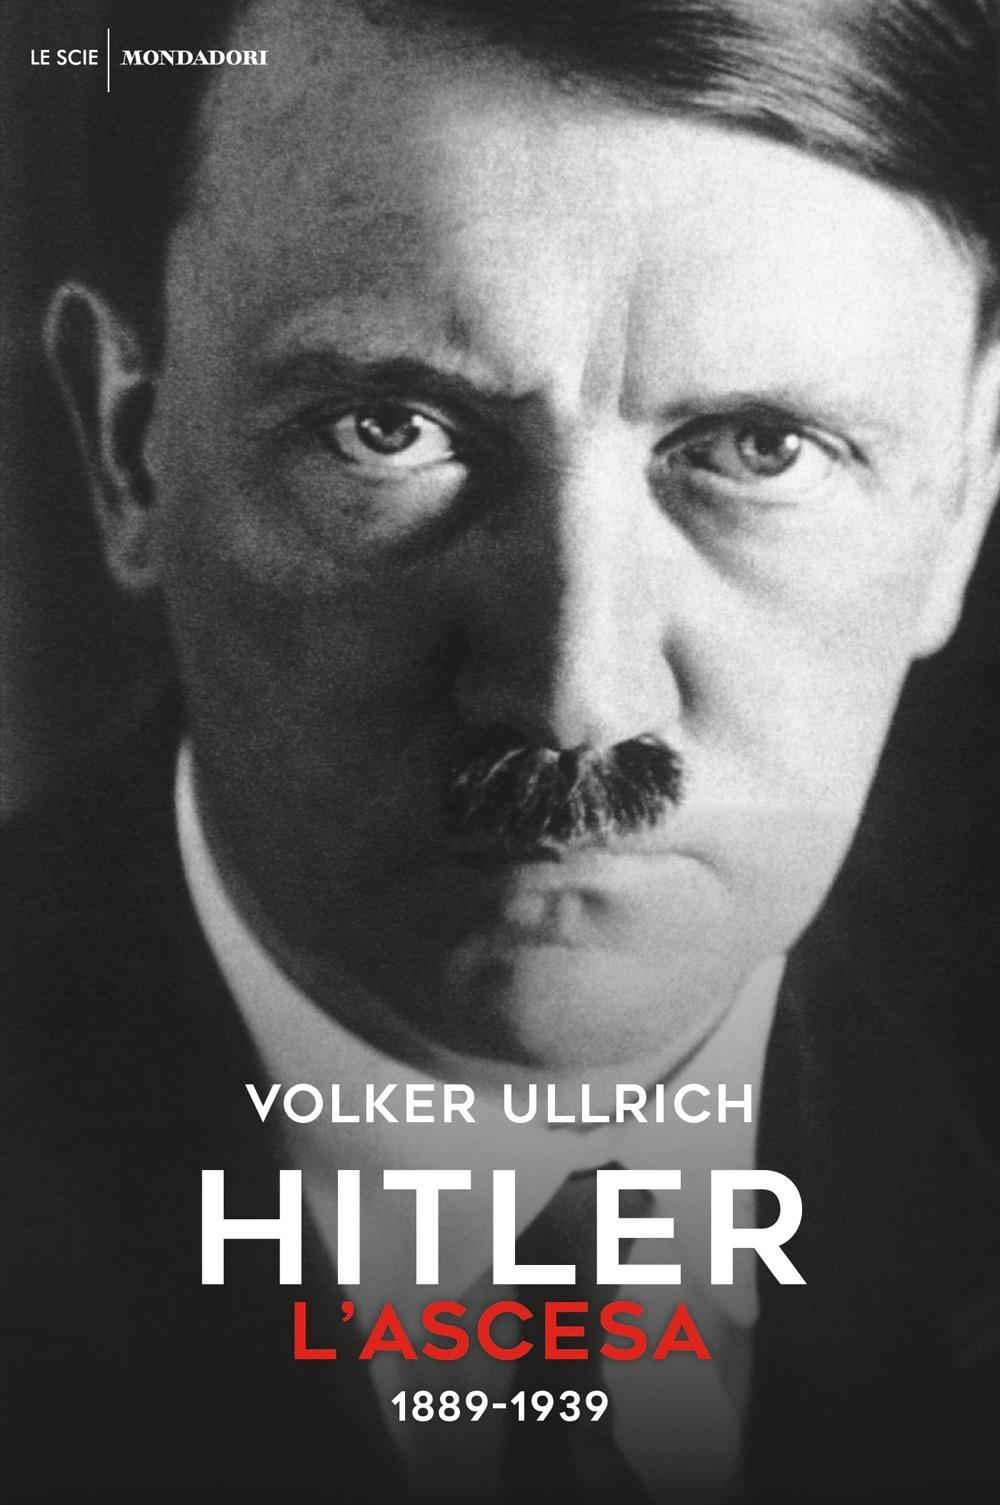 Ullrich Hitler